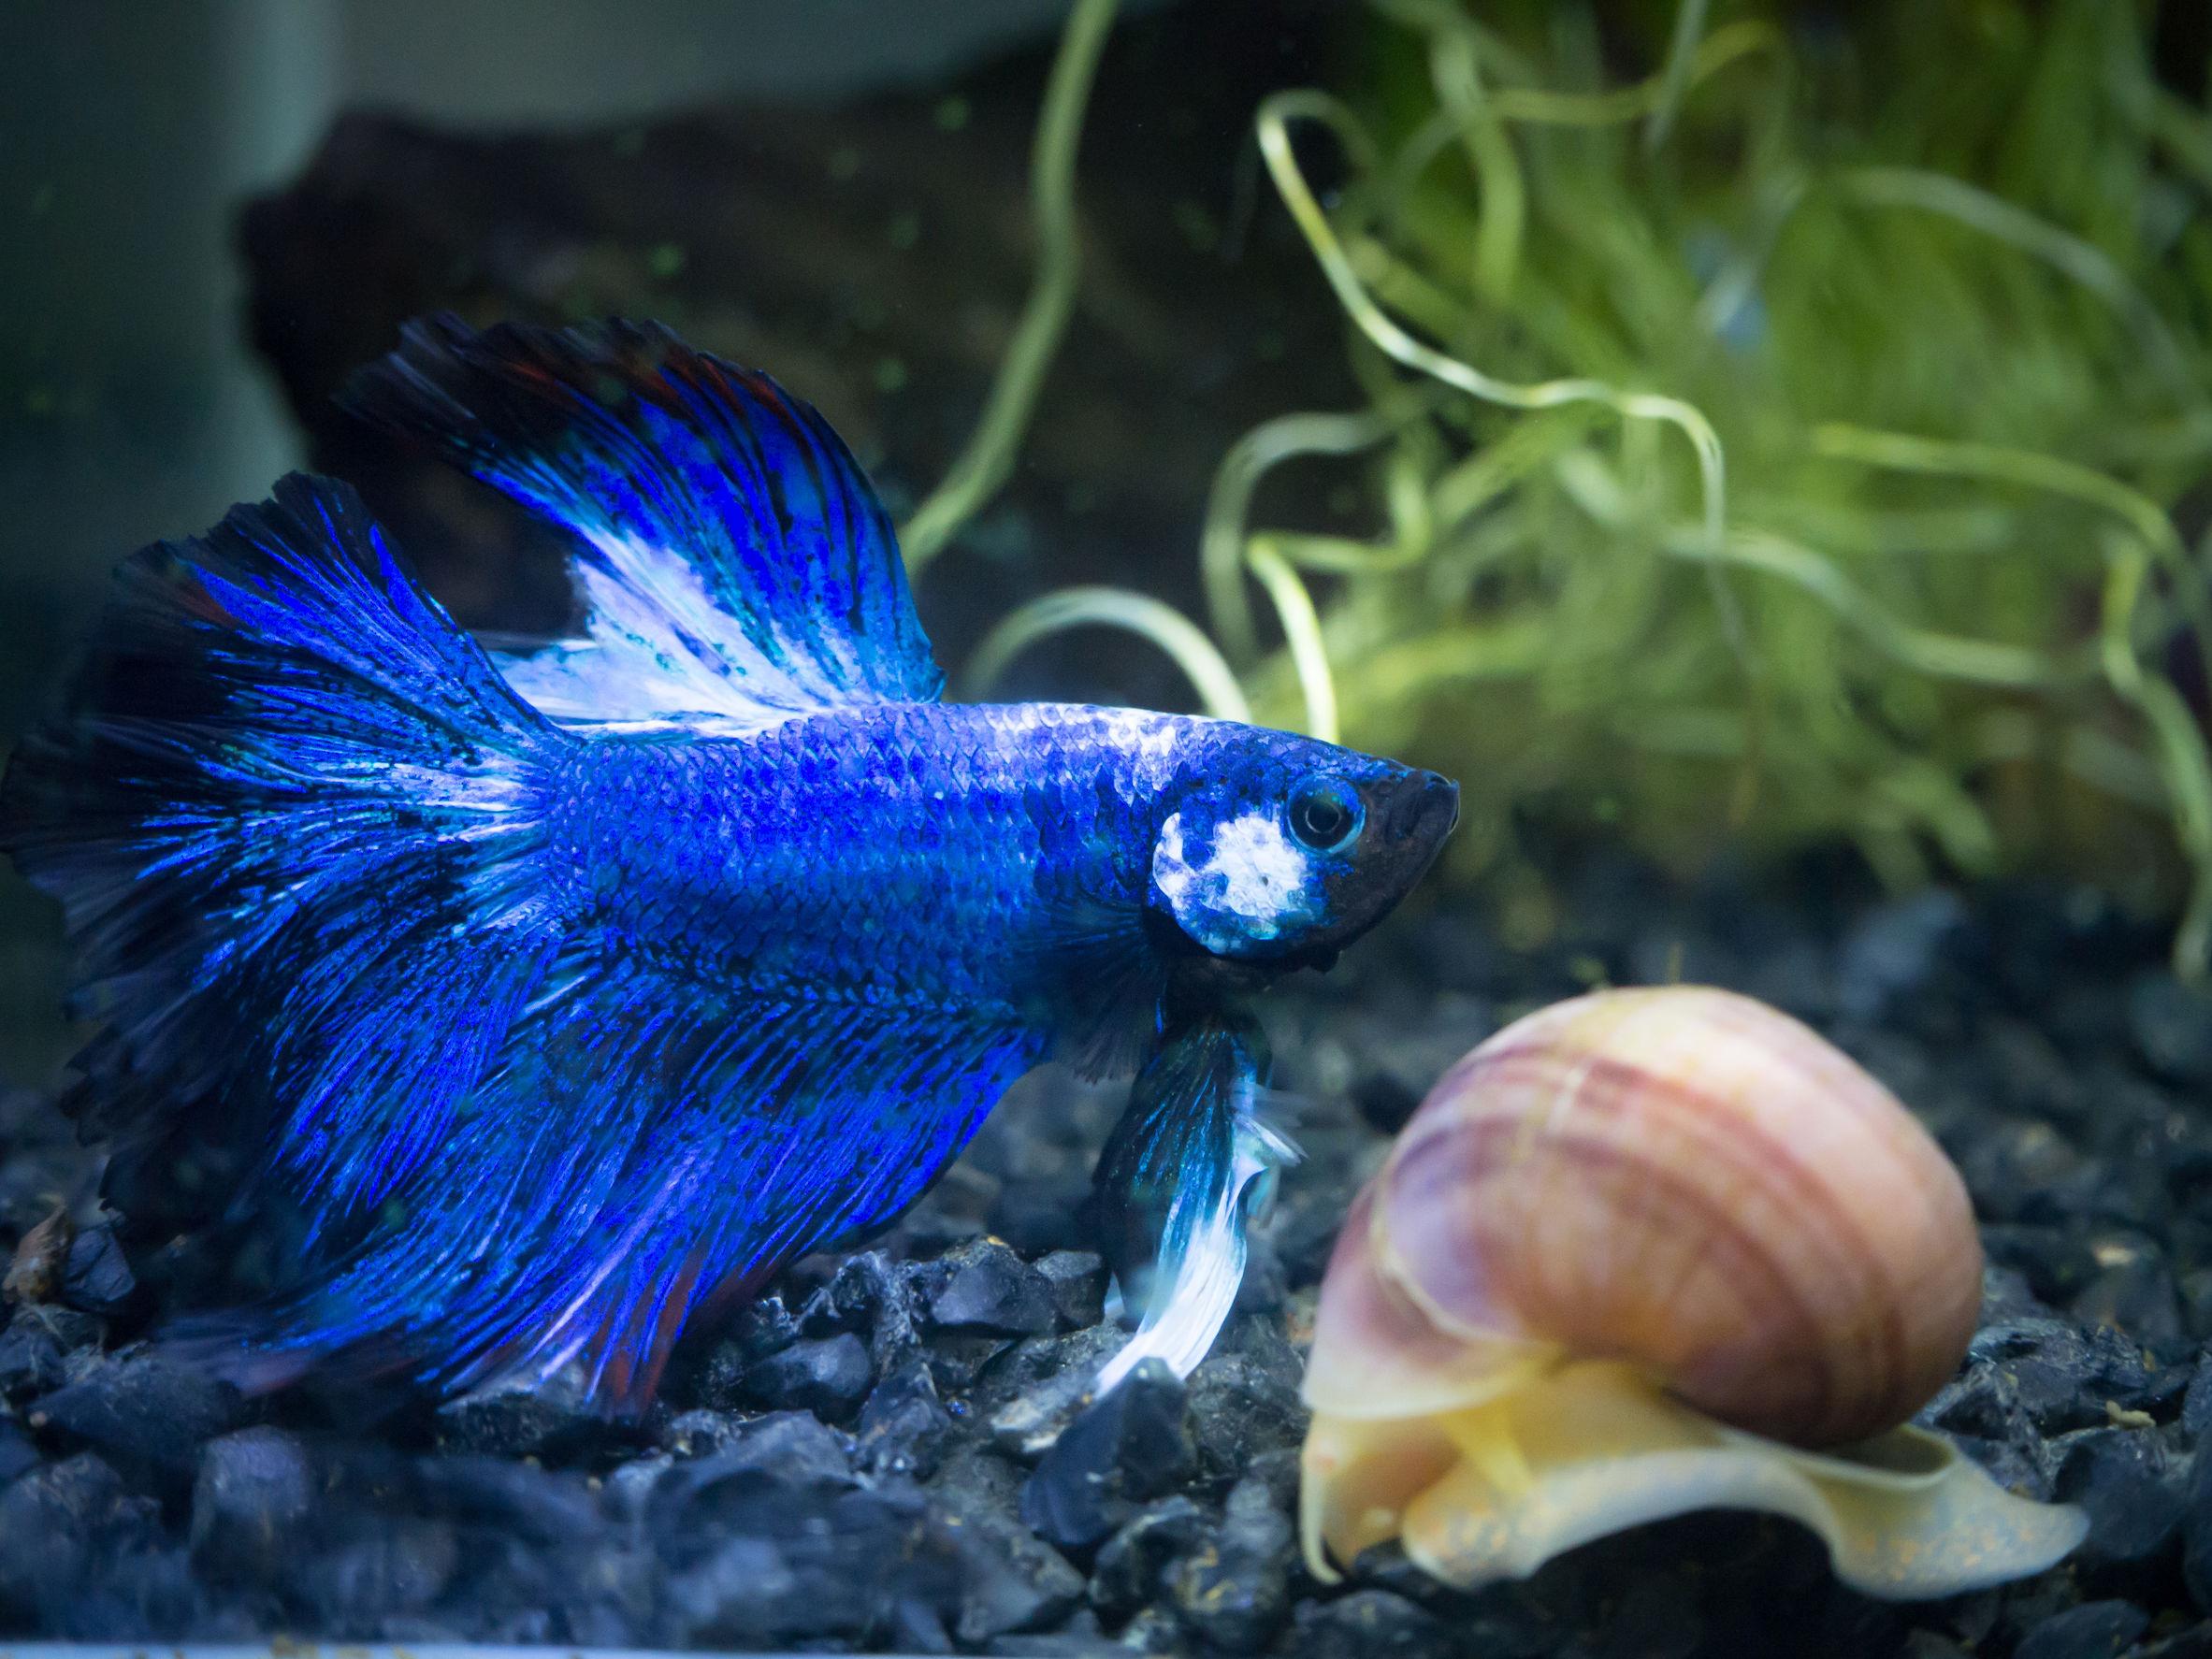 Blue betta swimming next to snail